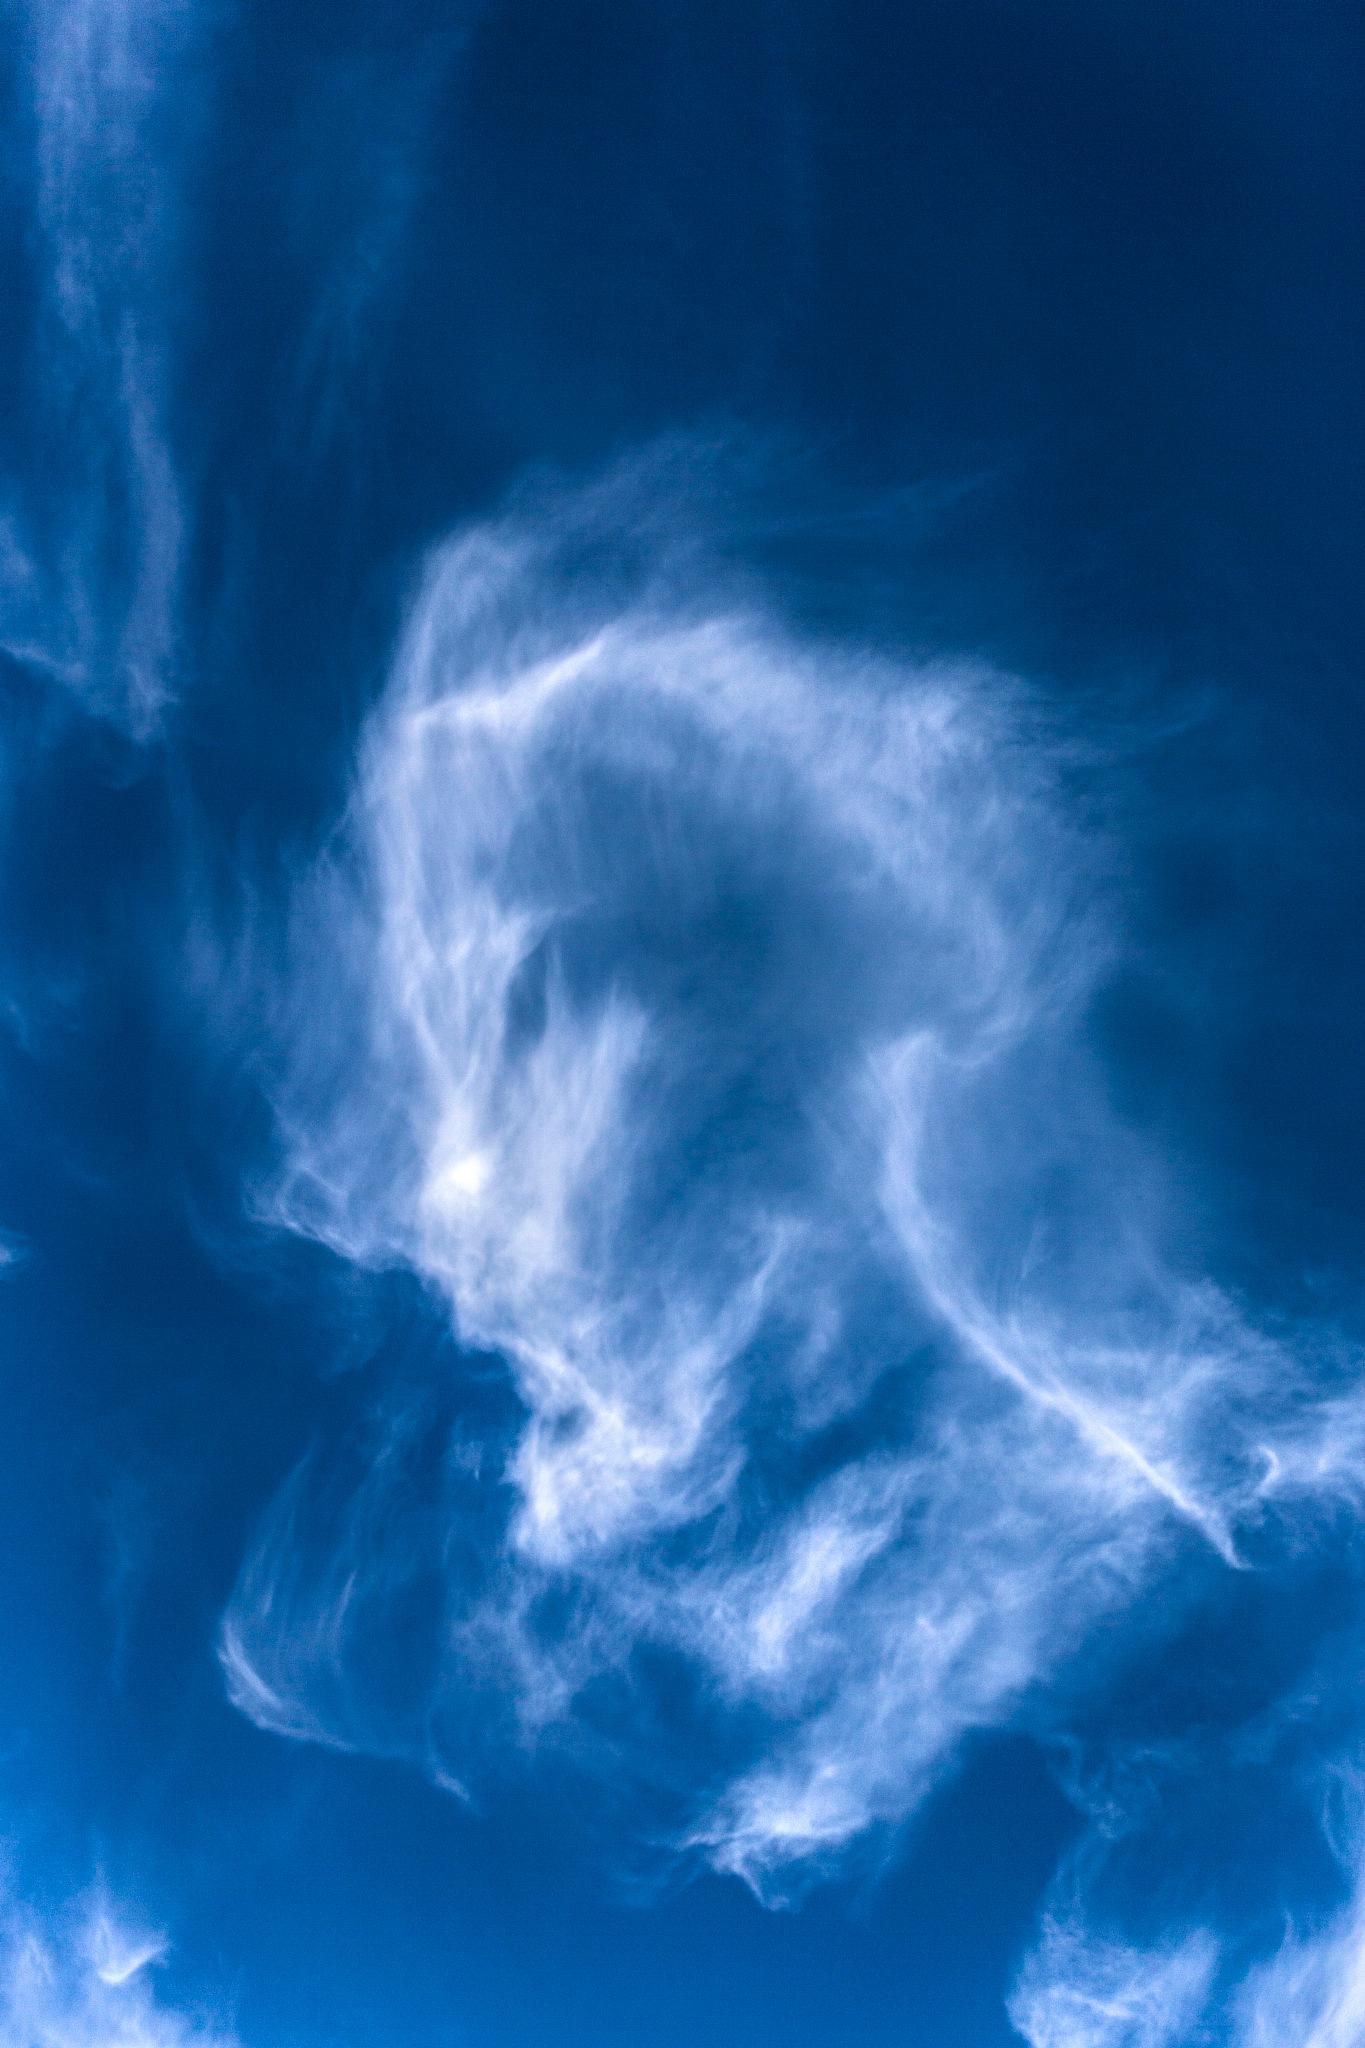 Clouds ツ by Odd Rune Wang